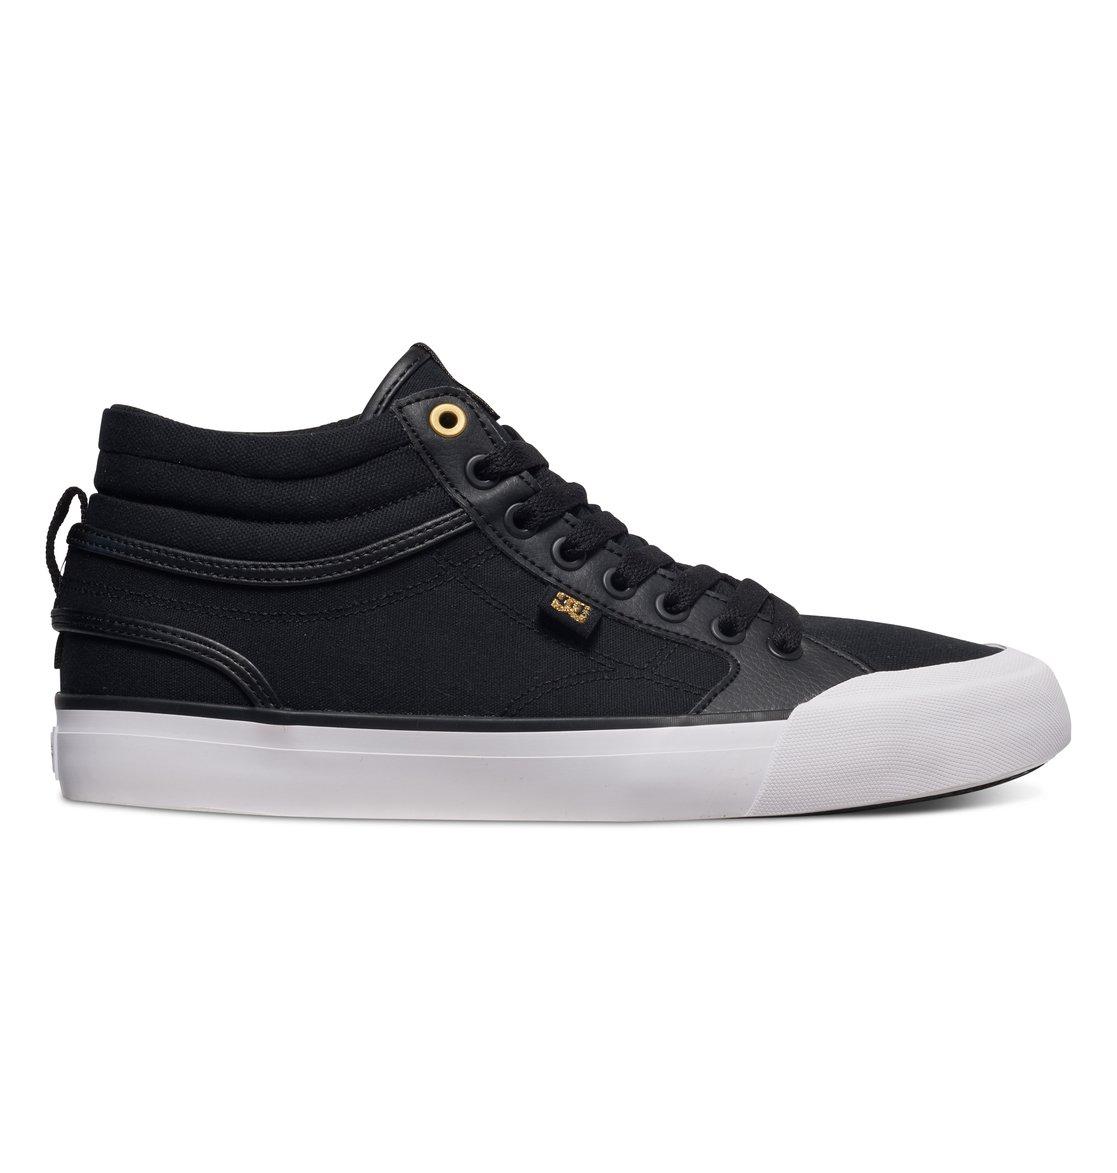 a7c9c11f1e9 0 Evan Smith Hi High Top Shoes ADYS300246 DC Shoes